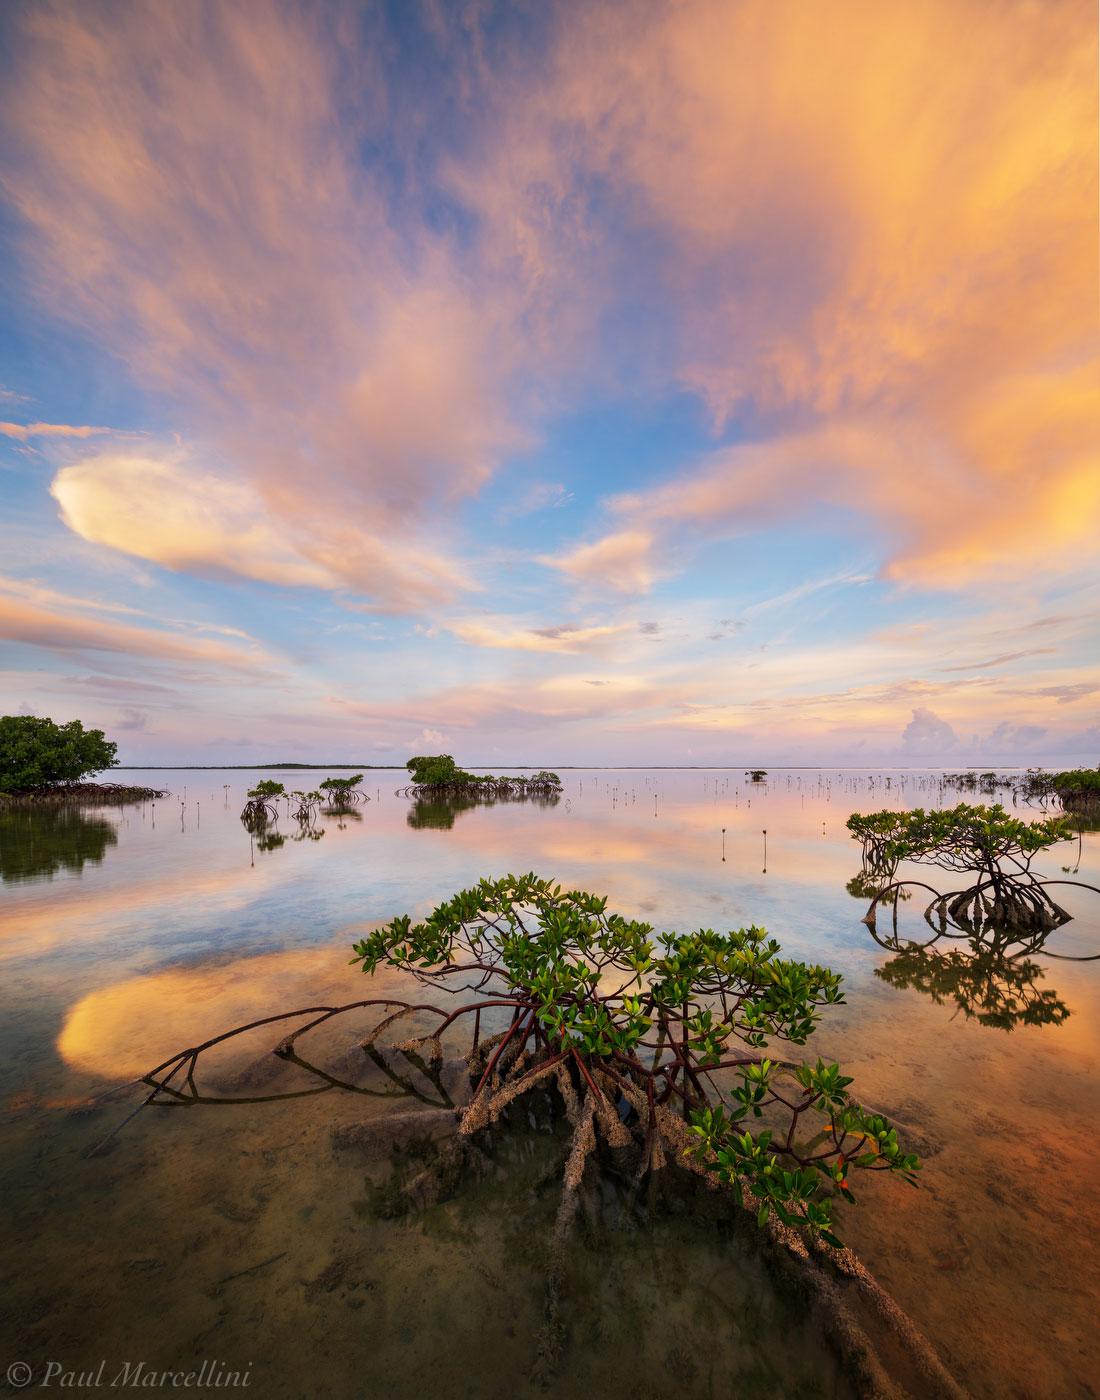 Sugarloaf Key, National Key Deer Refuge, Florida Keys, FL, red mangroves, sunrise, keys, florida, south florida, nature, photography, photo